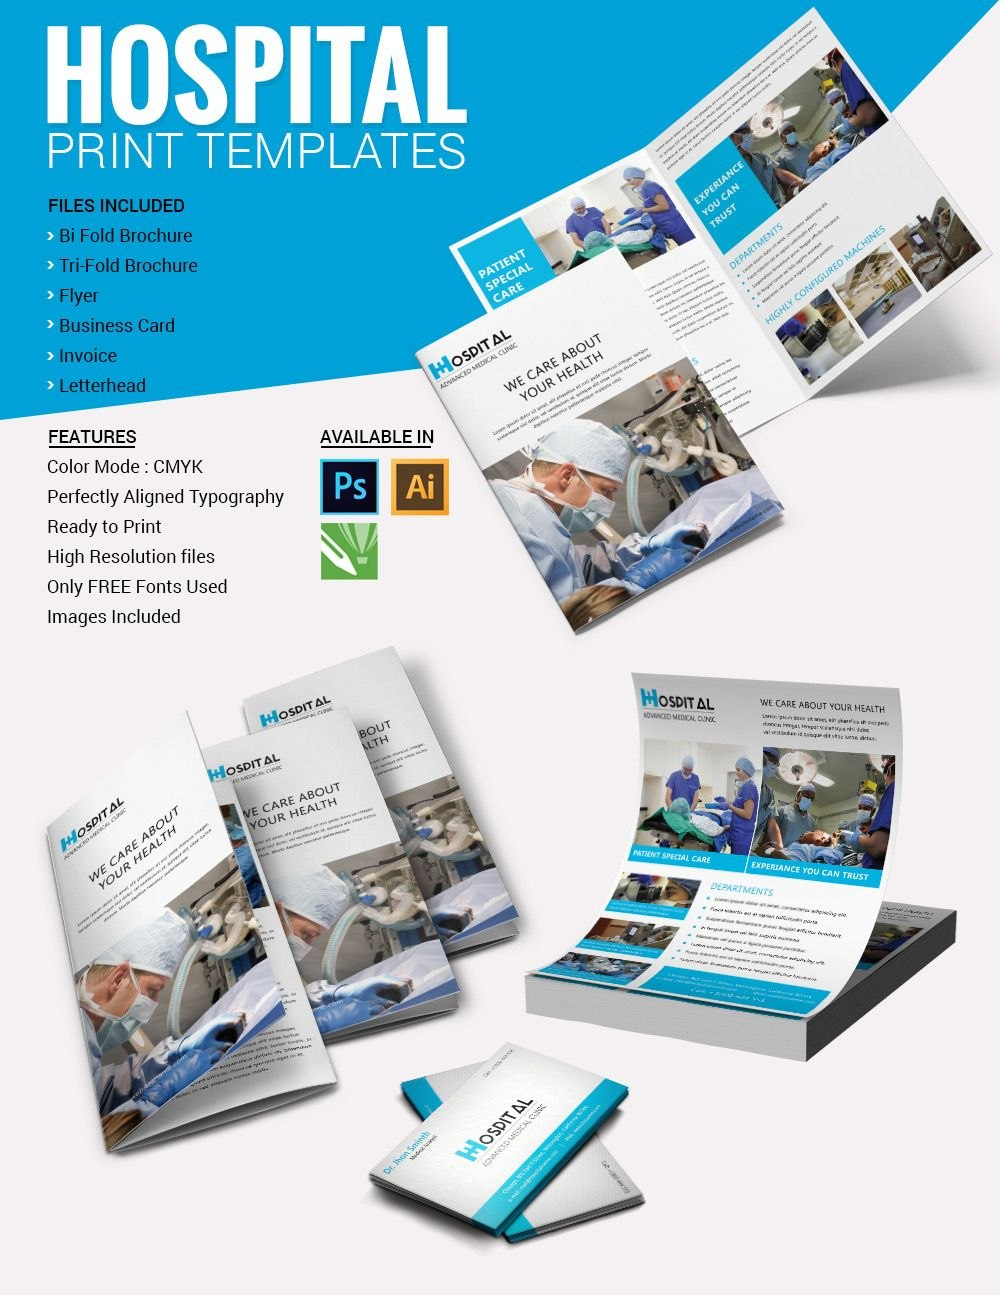 Brochura De Modelos Hospitalares  Impressos  Papelaria  Indesign Within Healthcare Brochure Templates Free Download